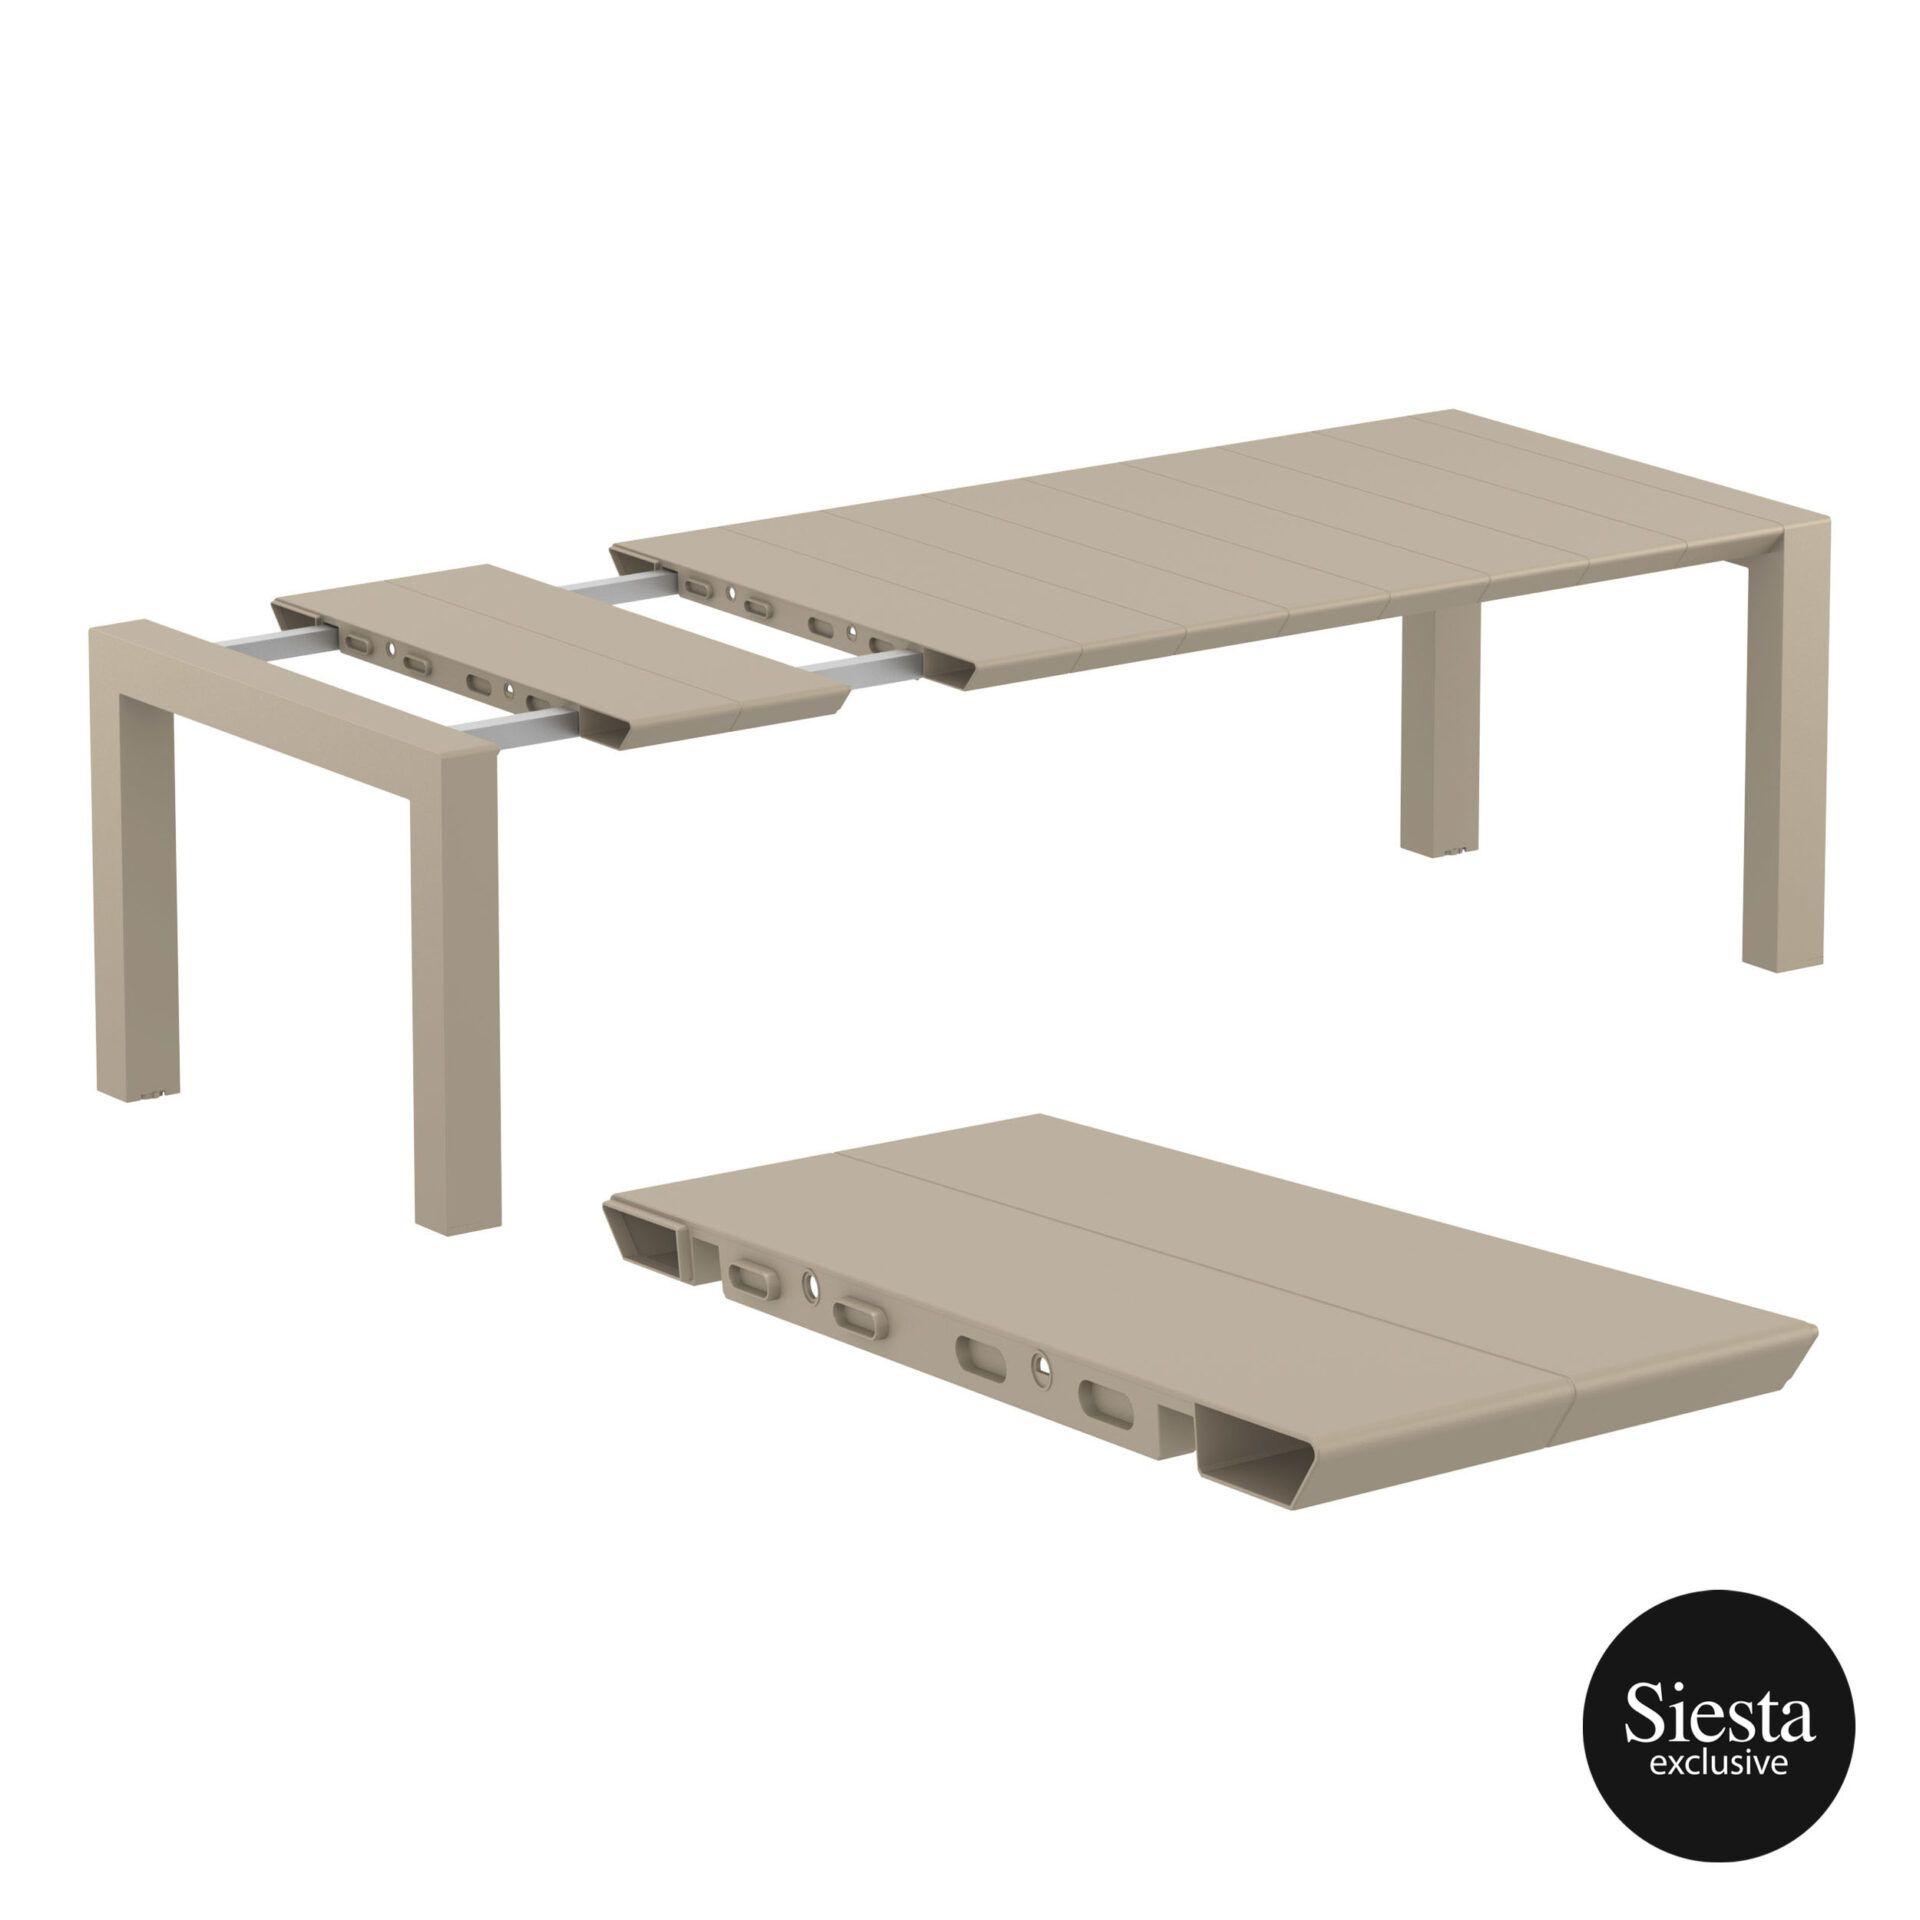 009 vegas table medium 220 taupe extension part